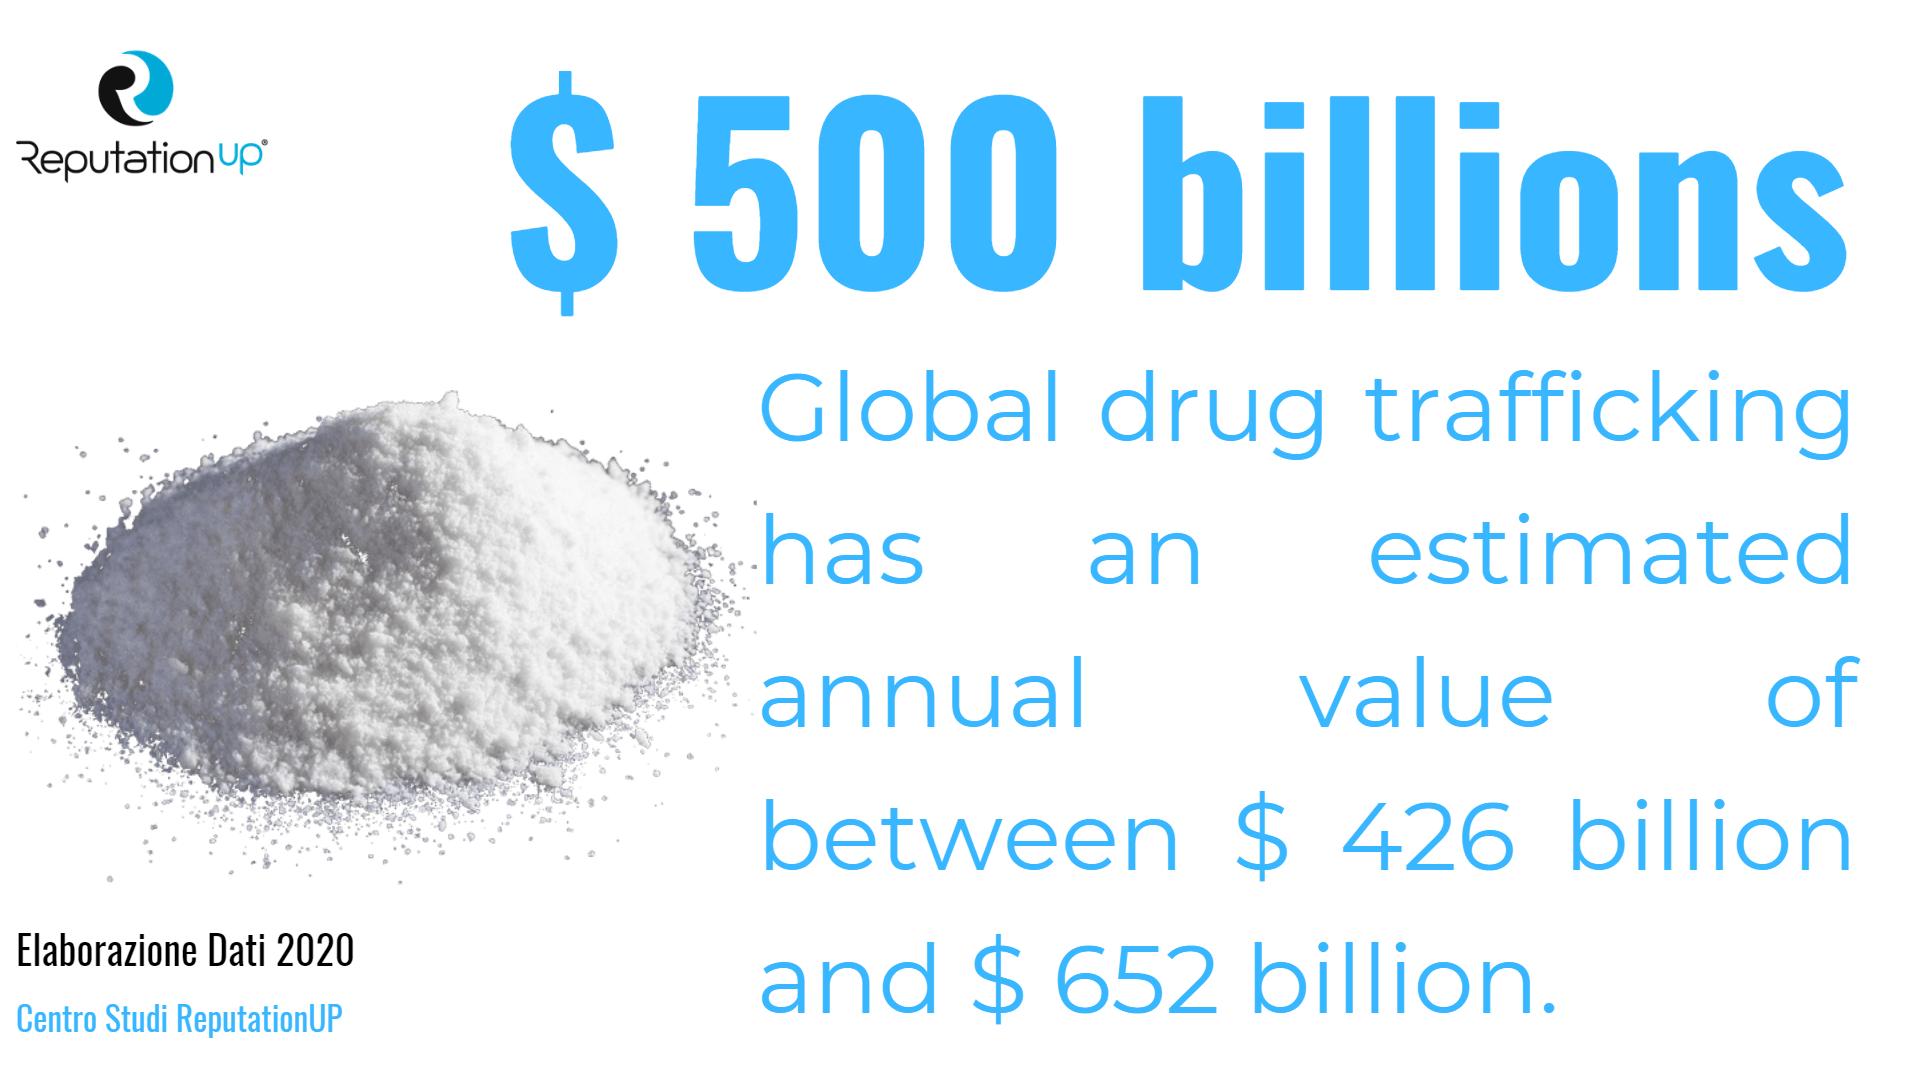 global drug trafficking estimated annual value 2020 reputationup statistic